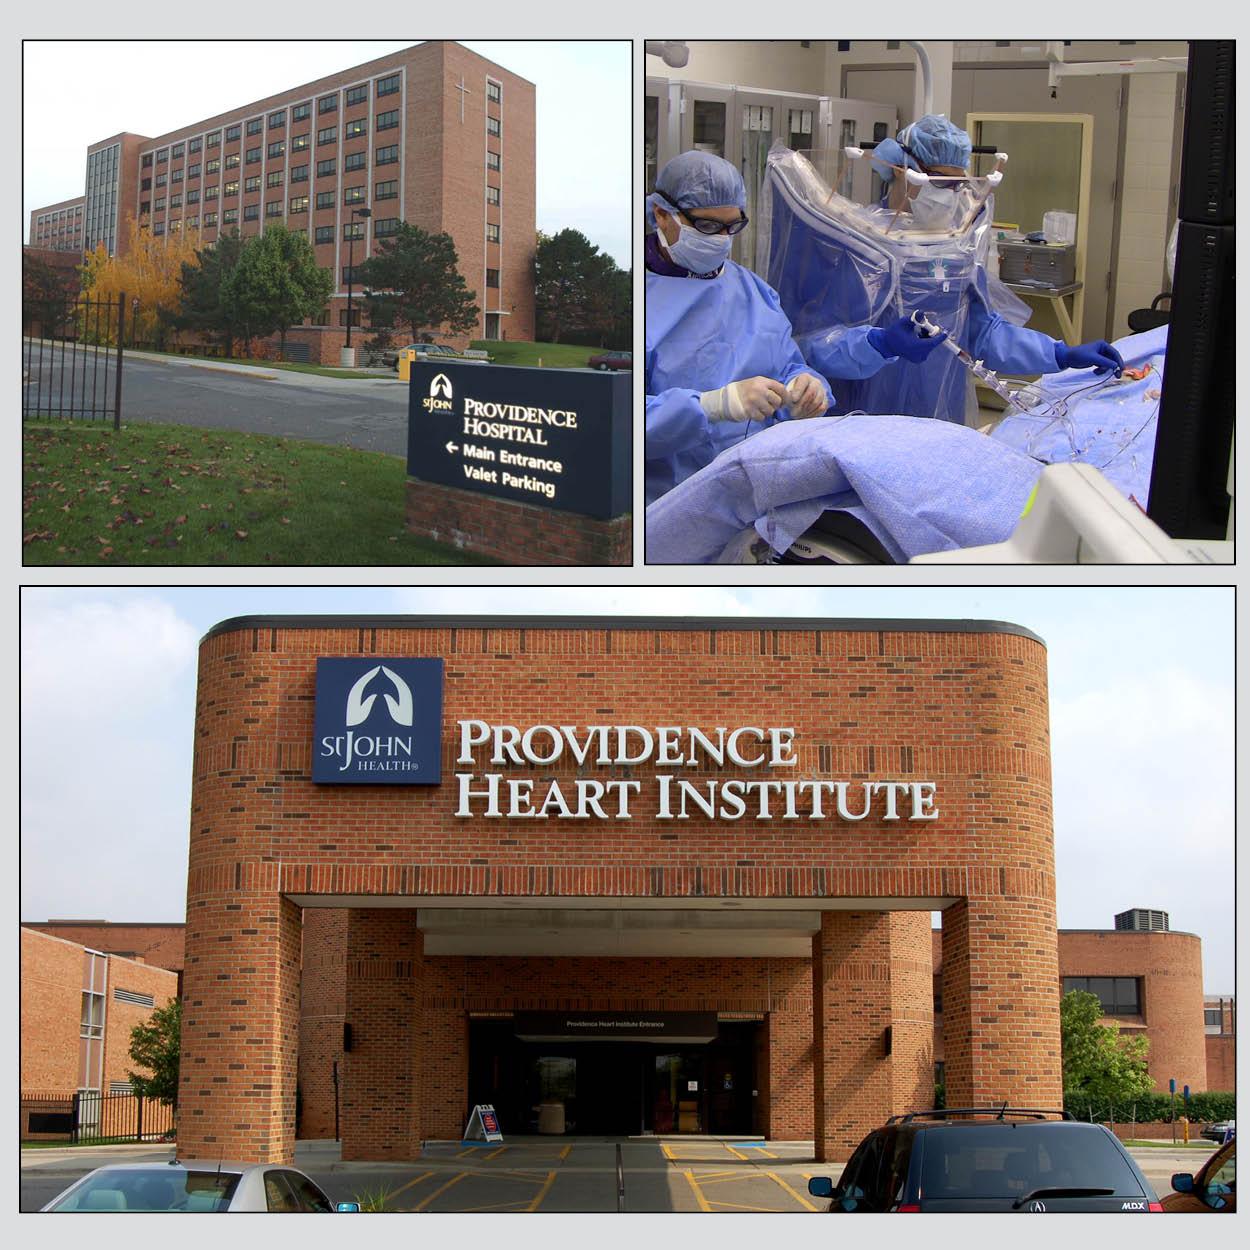 providence-hospital-medical-center